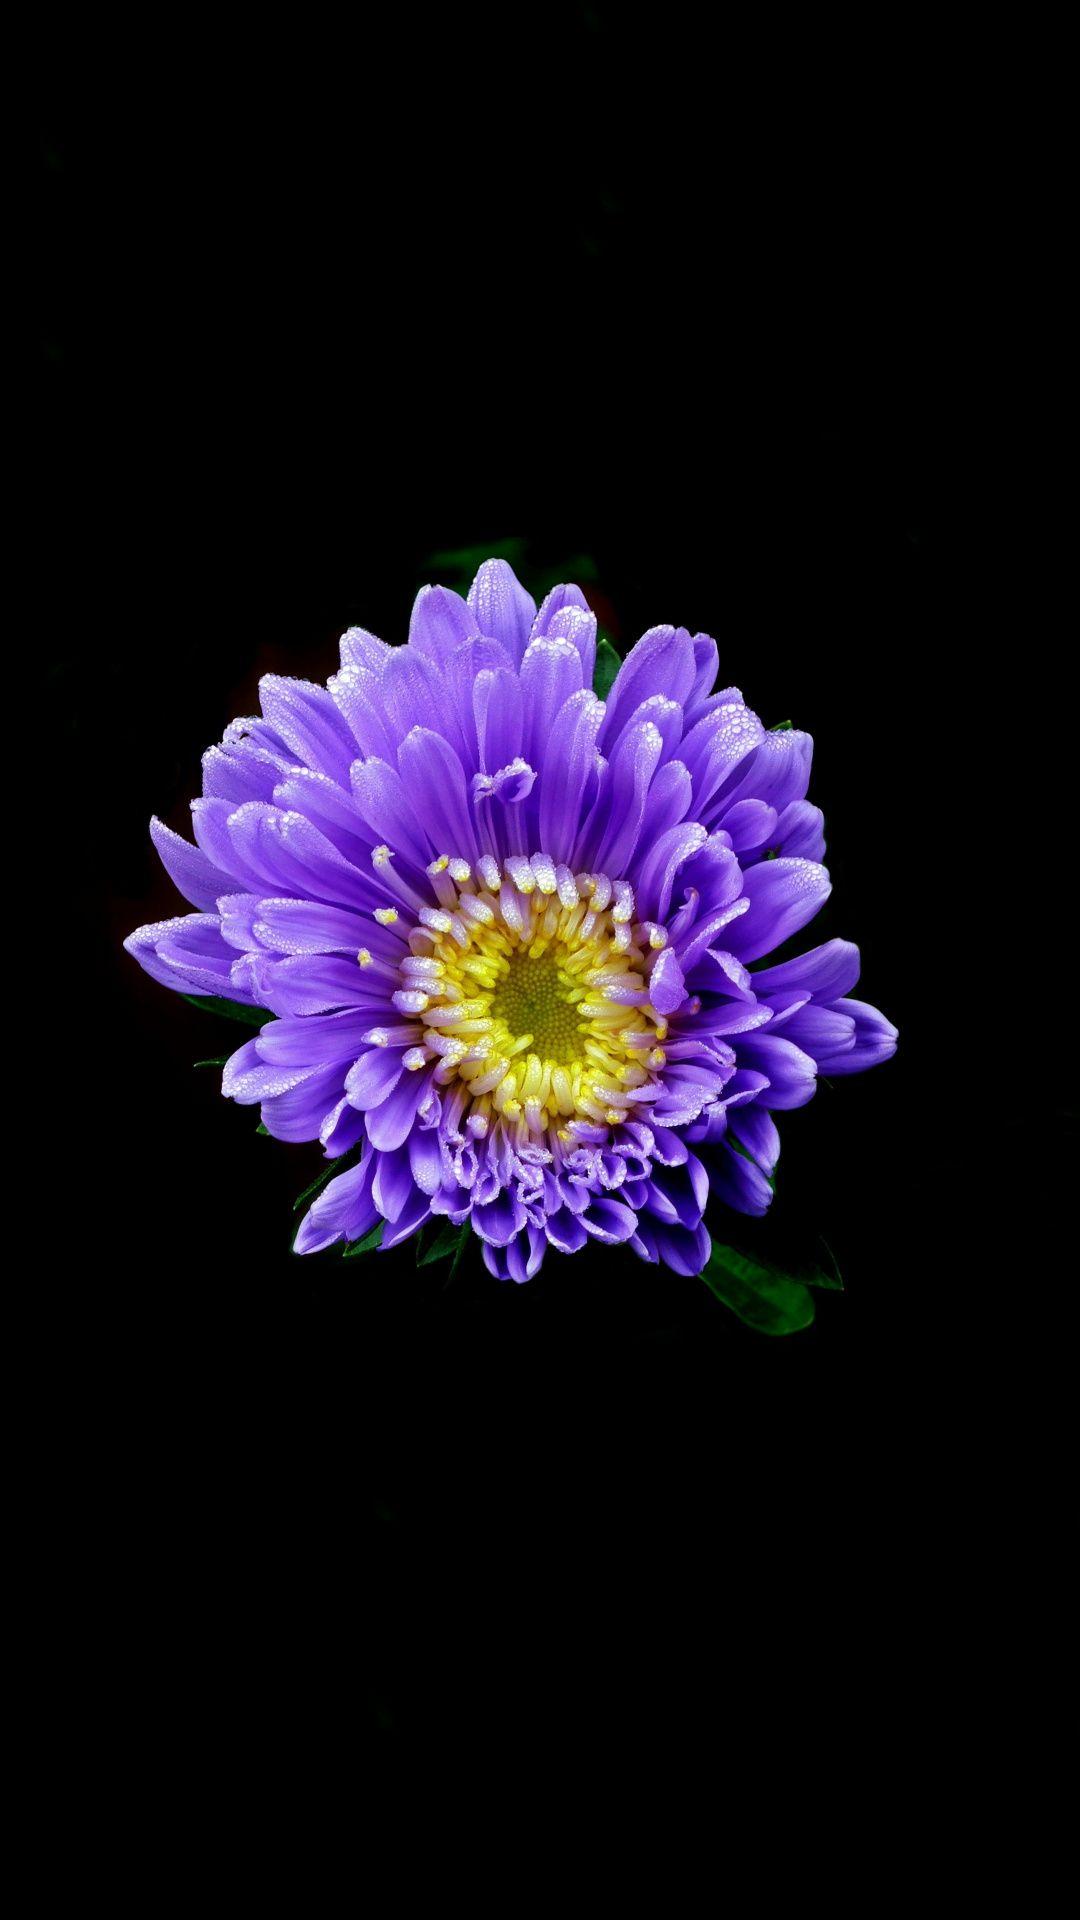 Aster Flower Blue Portrait 1080x1920 Wallpaper Aster Flower Flowers Photography Purple Flowers